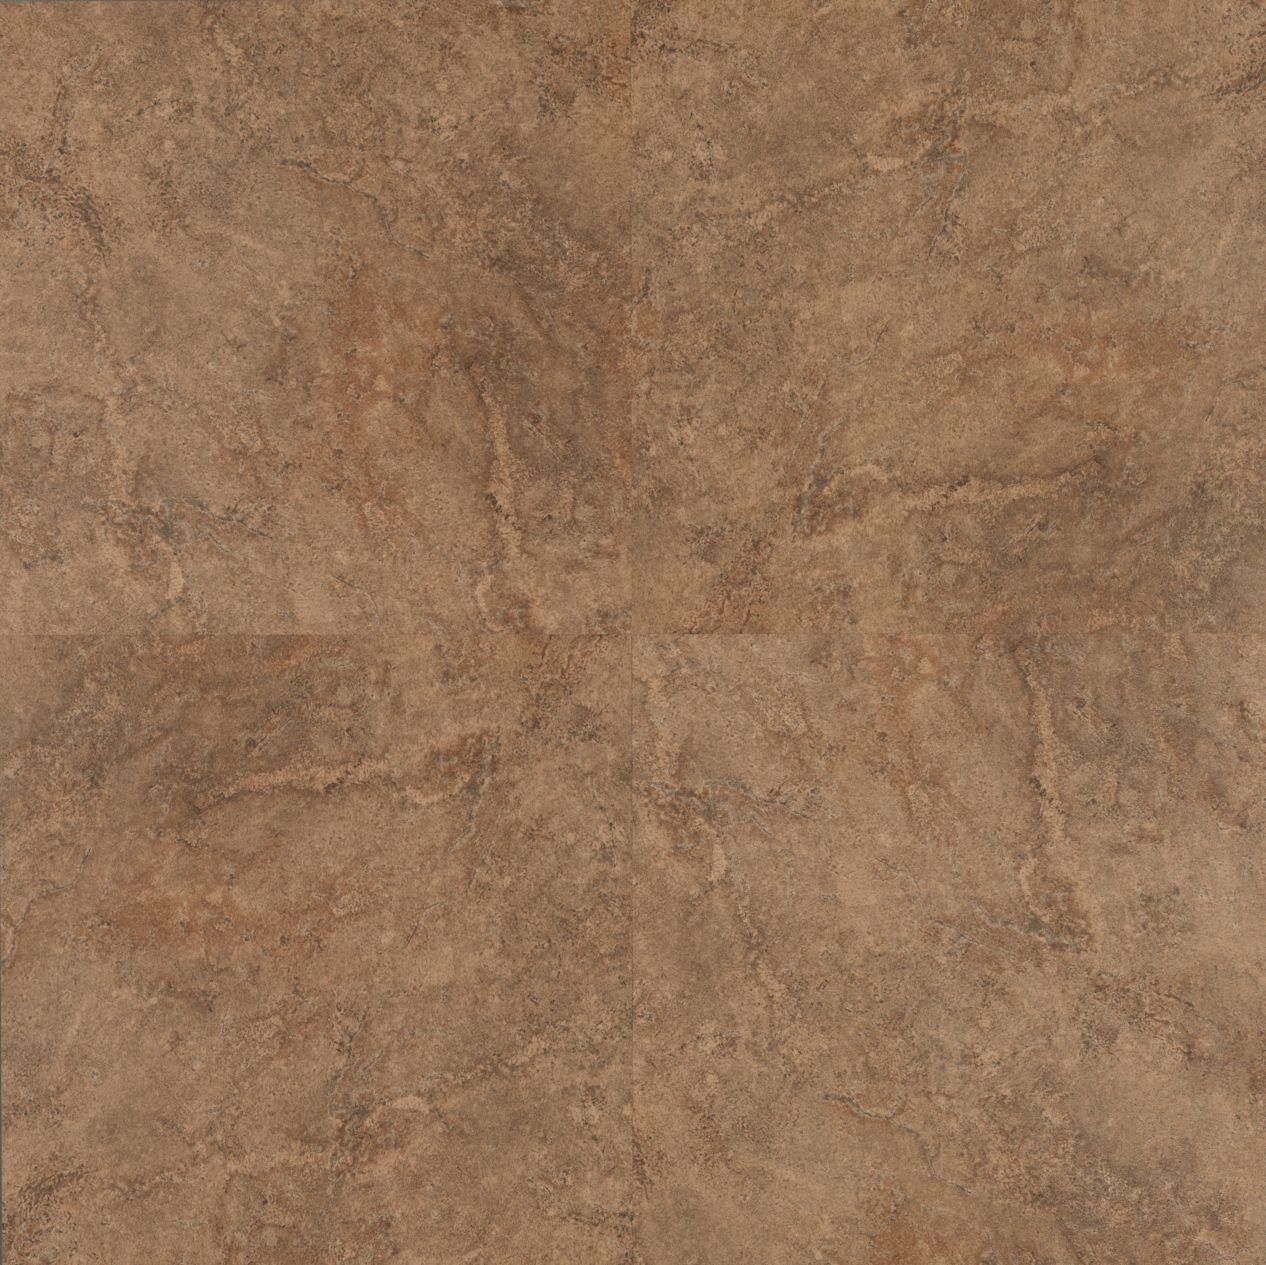 LuxuryVinyl ProspectsTile18x18 C9002-99 Noce